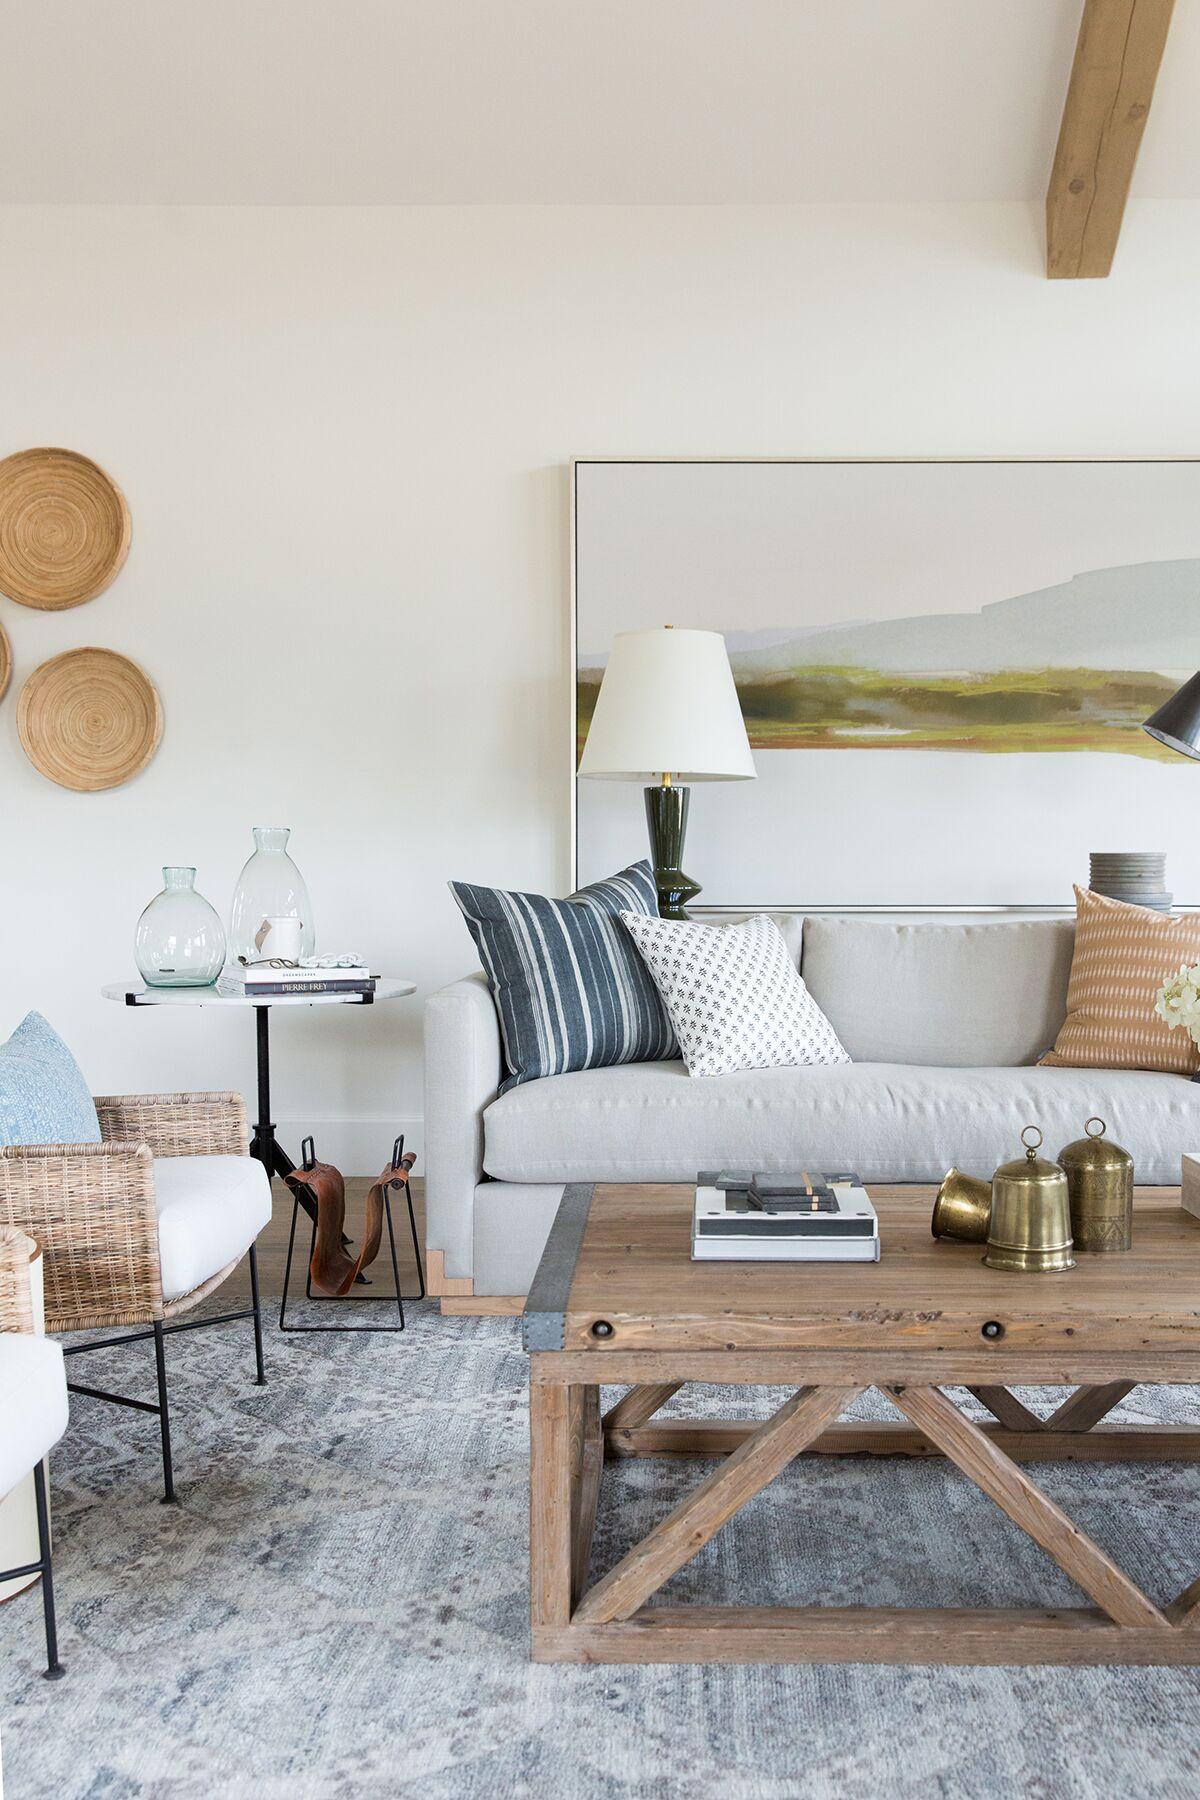 Moody,+textured,+rustic+inspired+living+room+in+mountain+home+in+Utah+-+Studio+McGee+Design-2.jpg